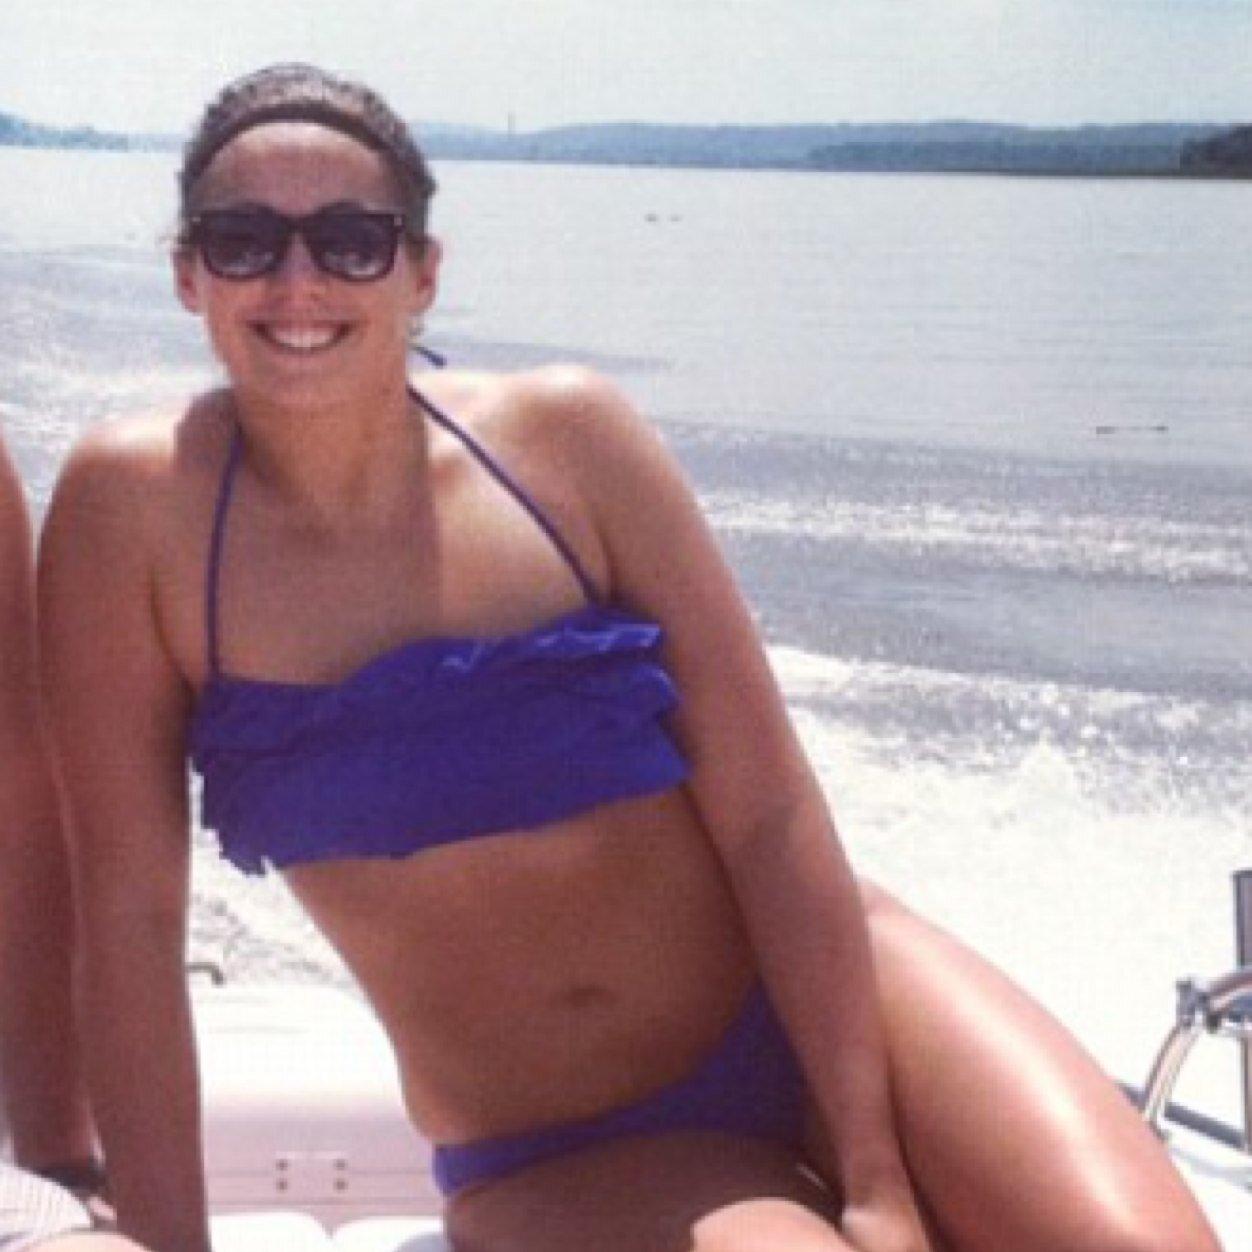 Bikini Jessica Rose nudes (93 foto and video), Pussy, Hot, Boobs, in bikini 2020